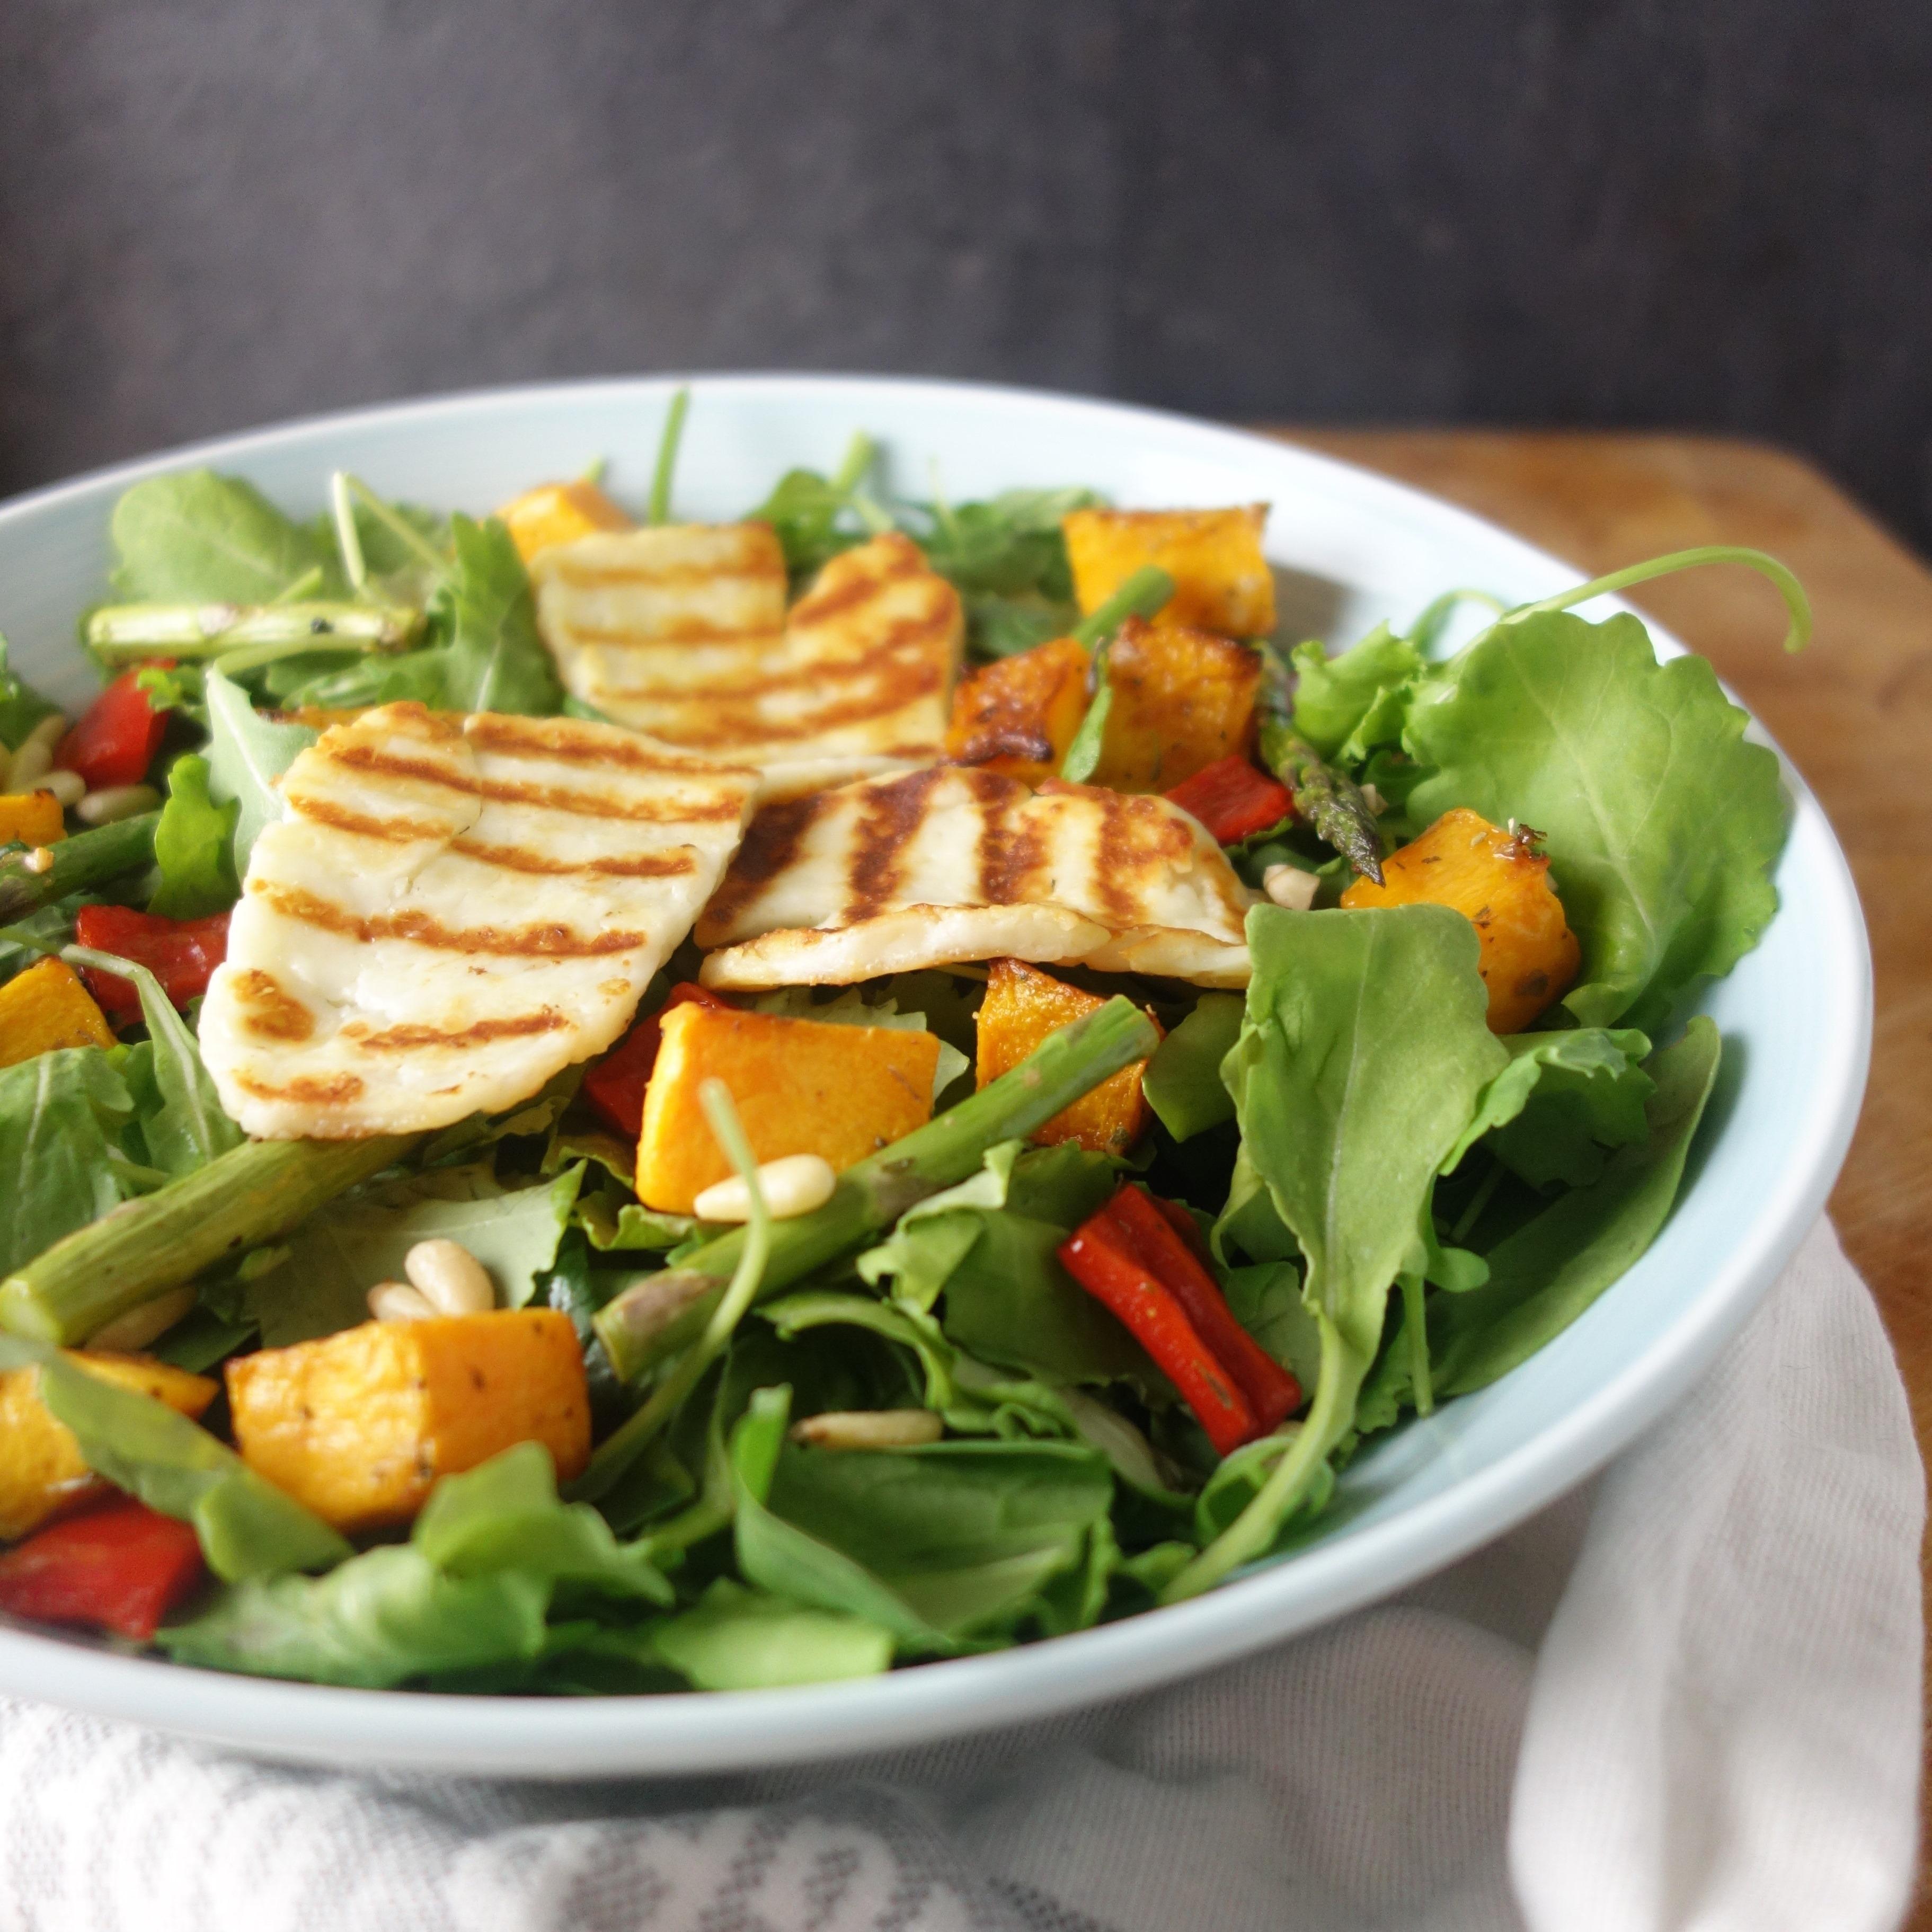 Warm Halloumi Butternut Squash Salad